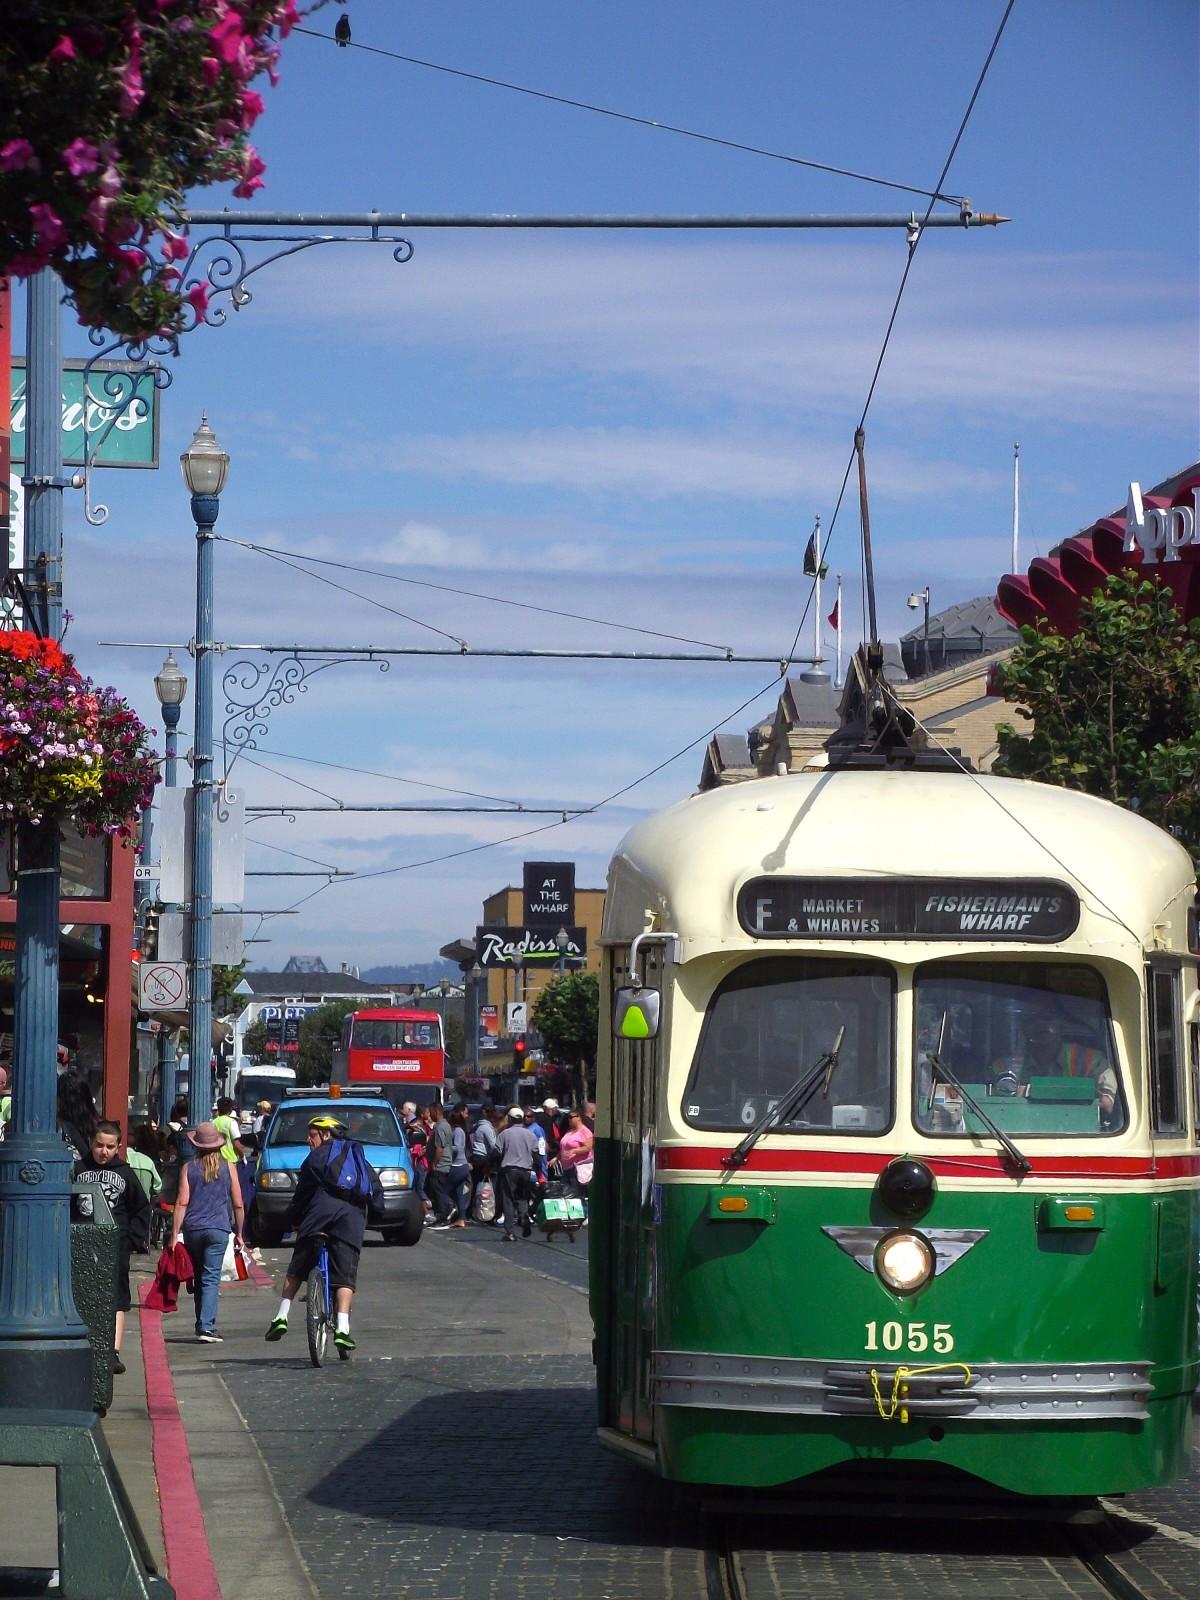 Free Images Vintage Urban Travel San Francisco Tram